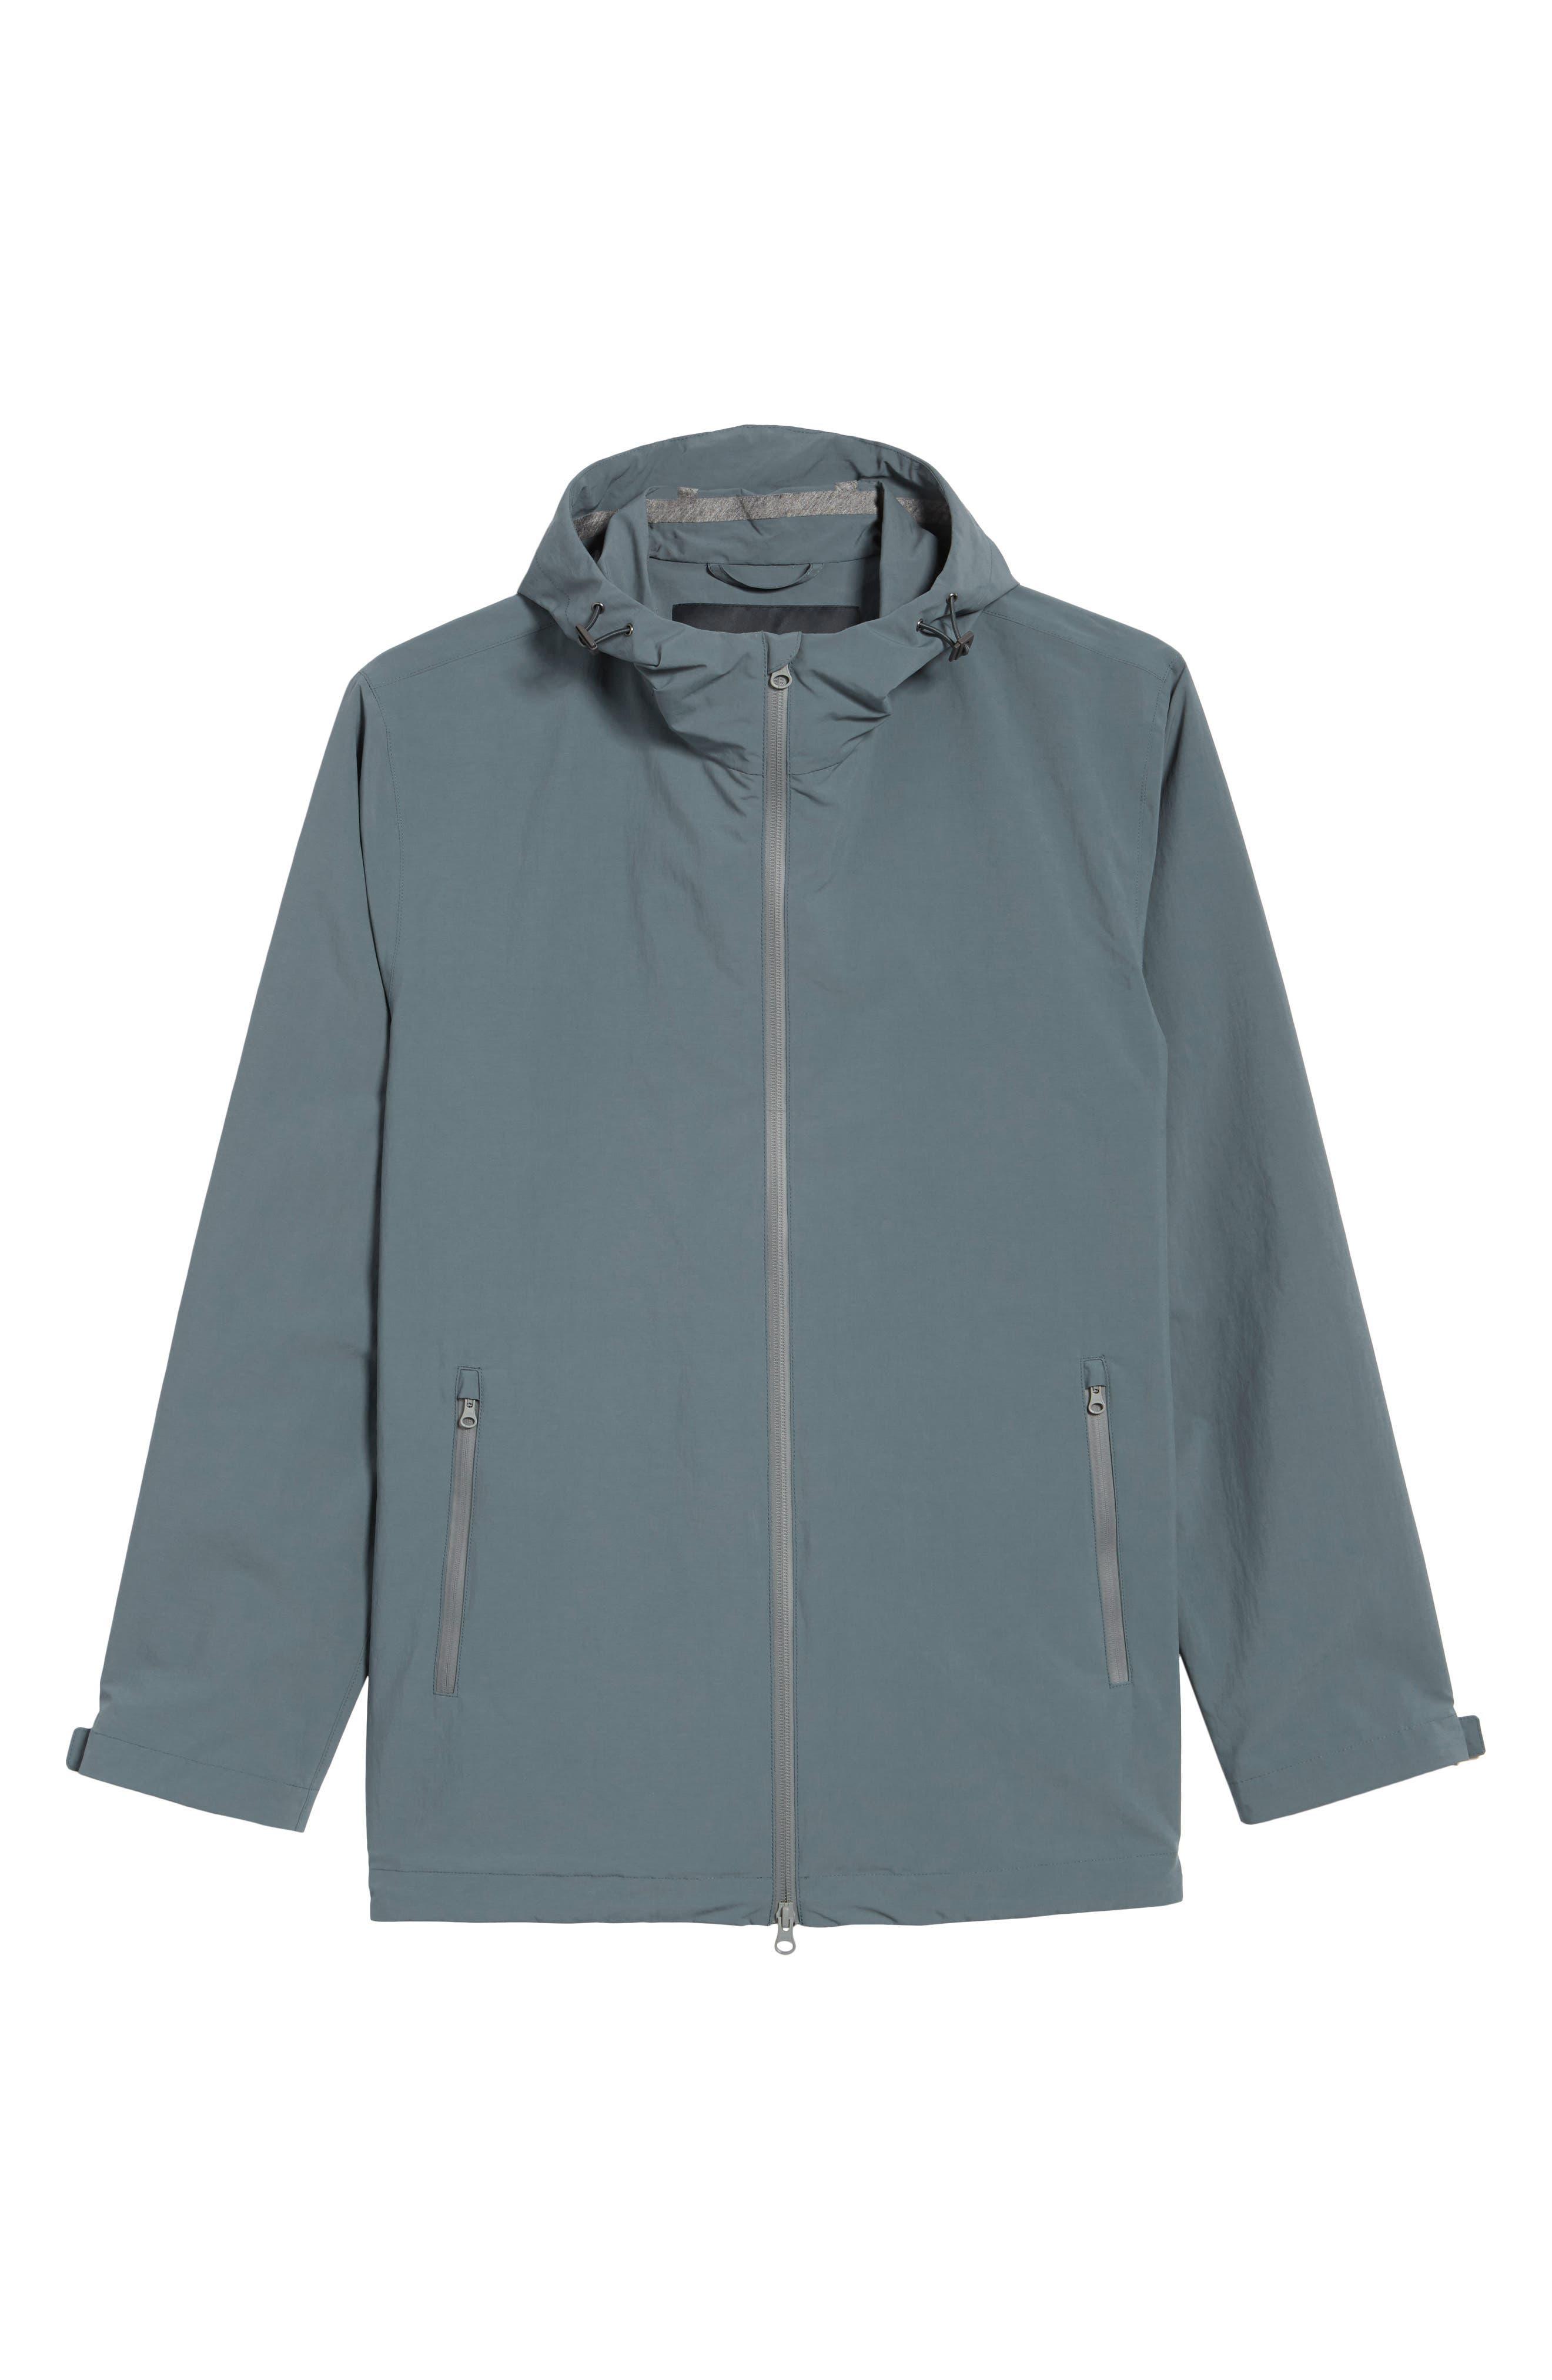 Plaster Hooded Raincoat,                             Alternate thumbnail 6, color,                             Blue/ Grey